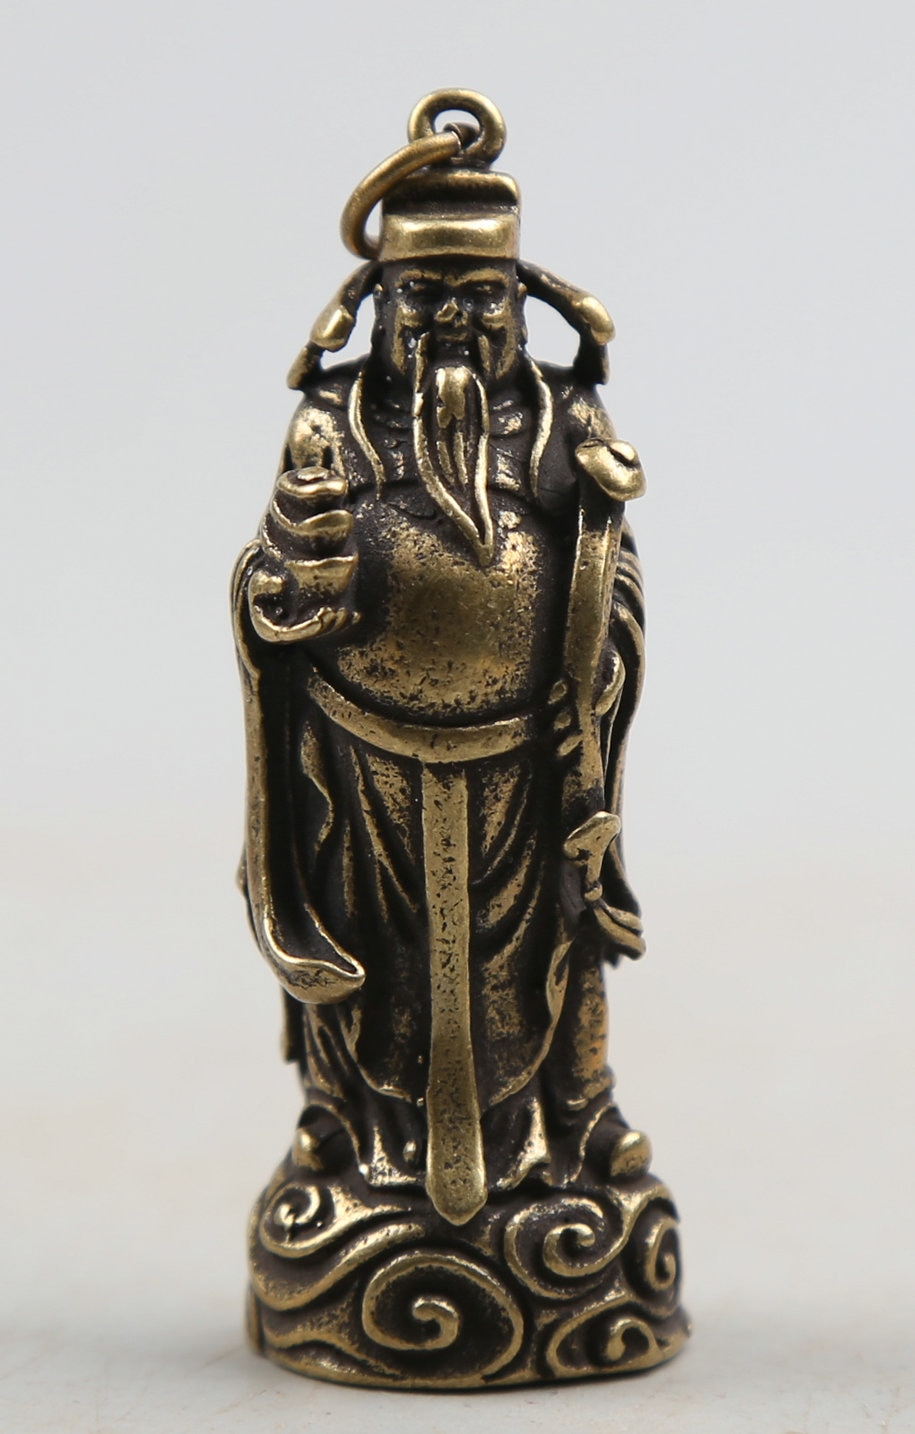 "56MM/2,2 ""recoger Curio raro BRONCE DE Fengshui chino exquisito Ruyi Yuen Bo Mammon riqueza monetaria Dios colgante estatua 28g"